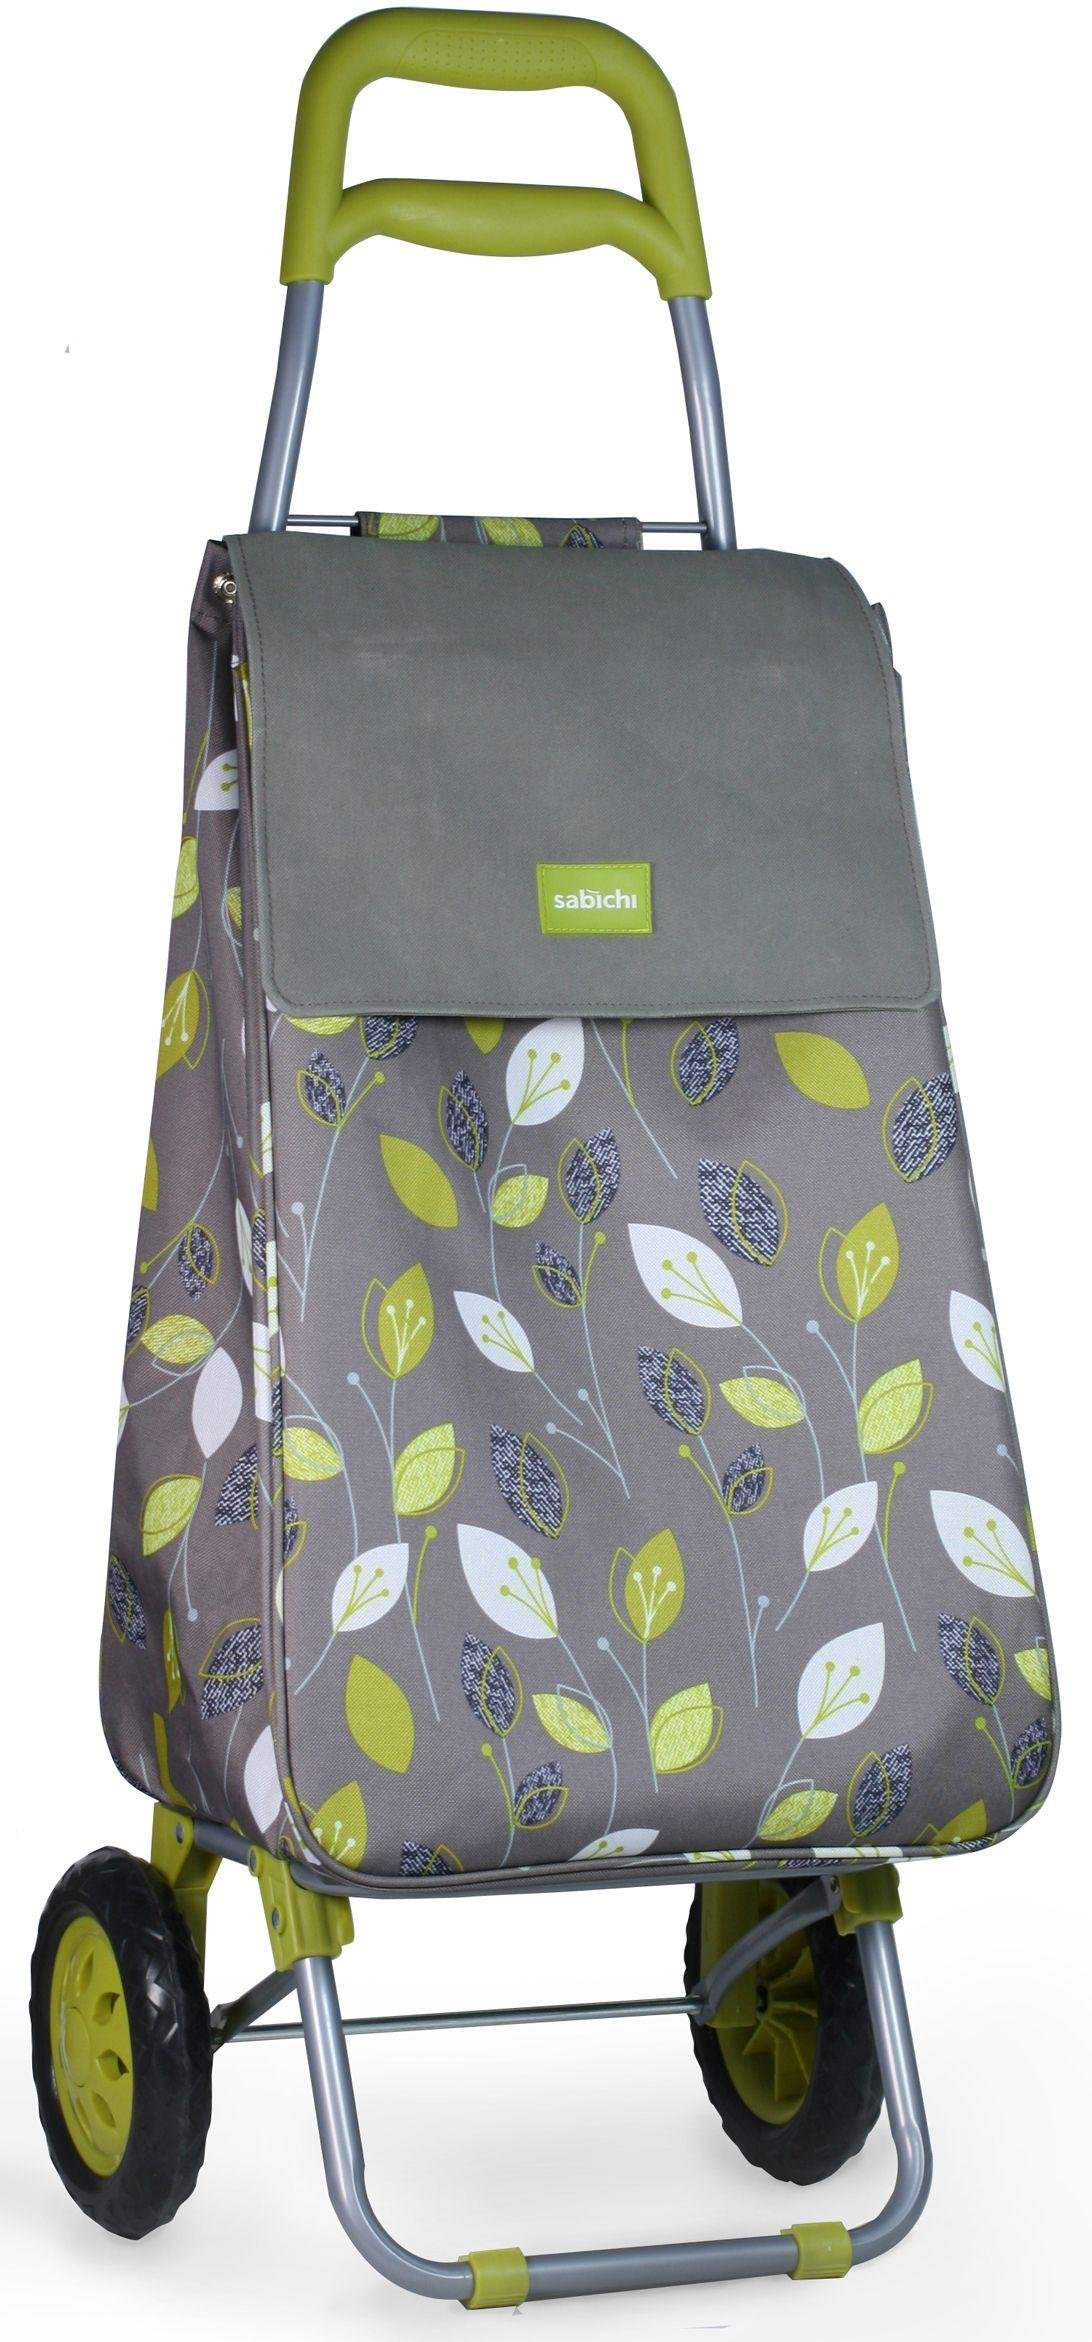 SALE on Sabichi - Lemongrass Shopping Trolley